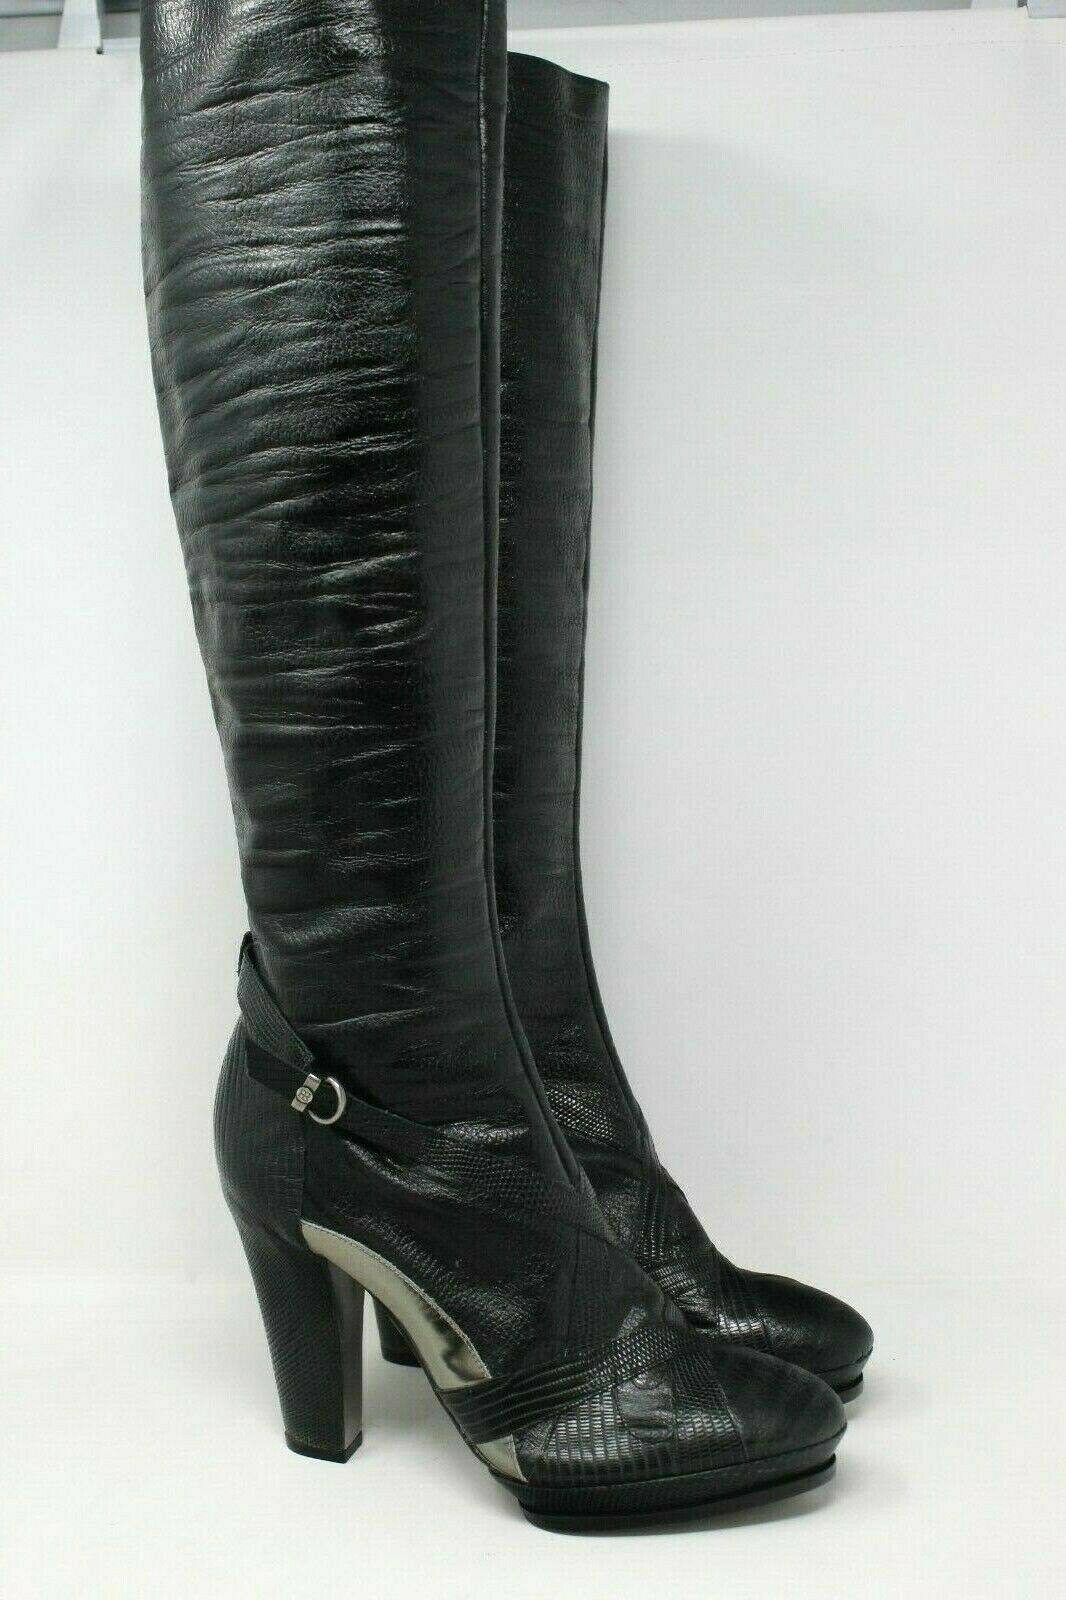 BCBGMAXAZRIA Leather Platform Boots Chrome Detail in Black - 8 US  NEW